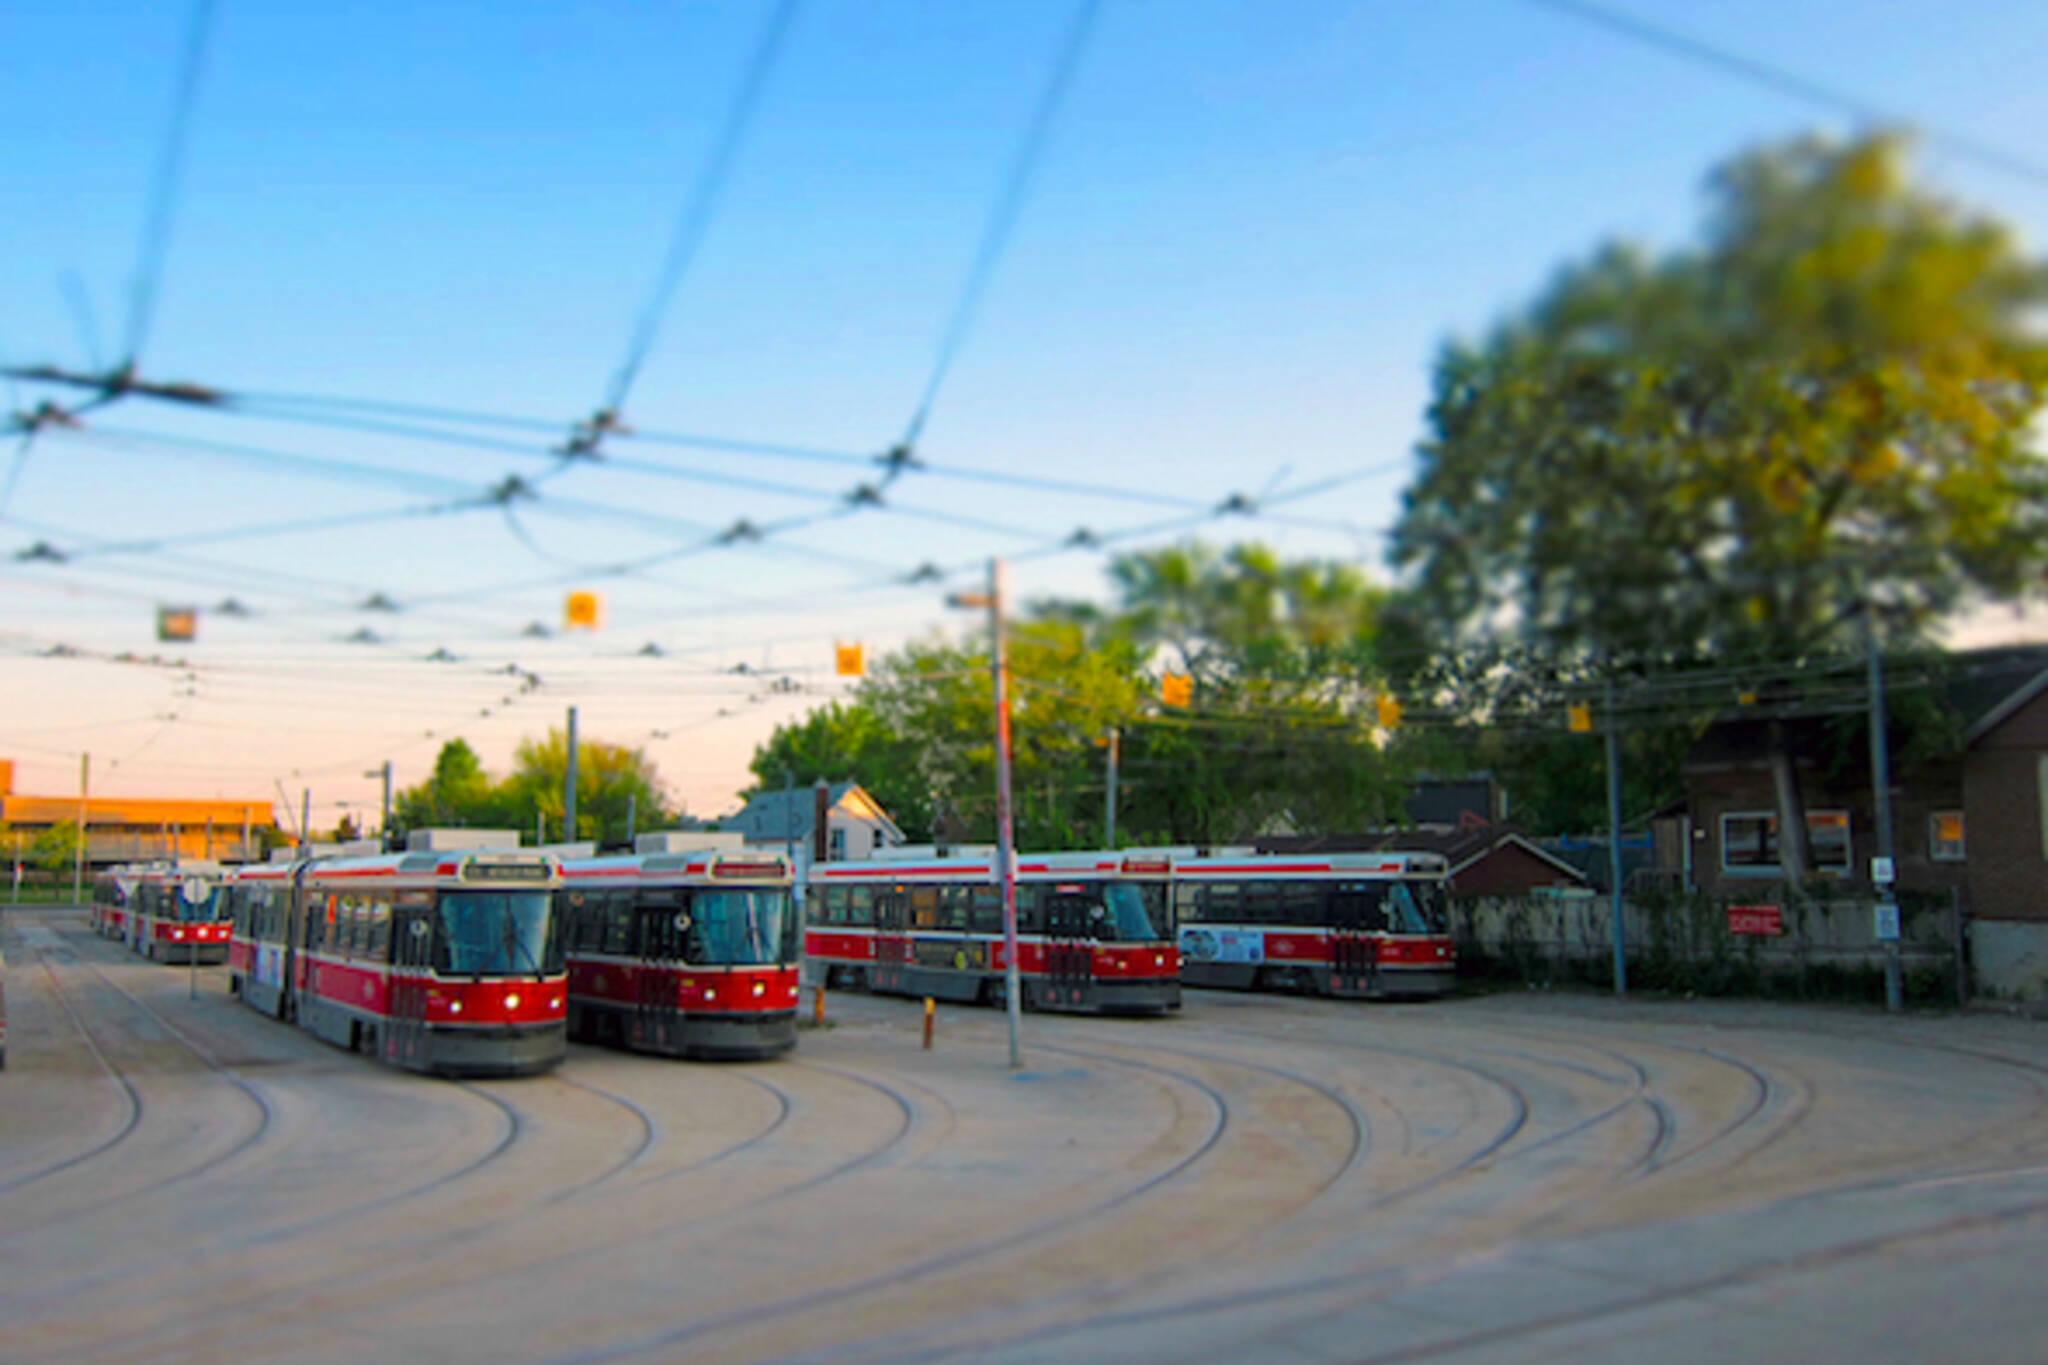 streetcars greenwood yard morning